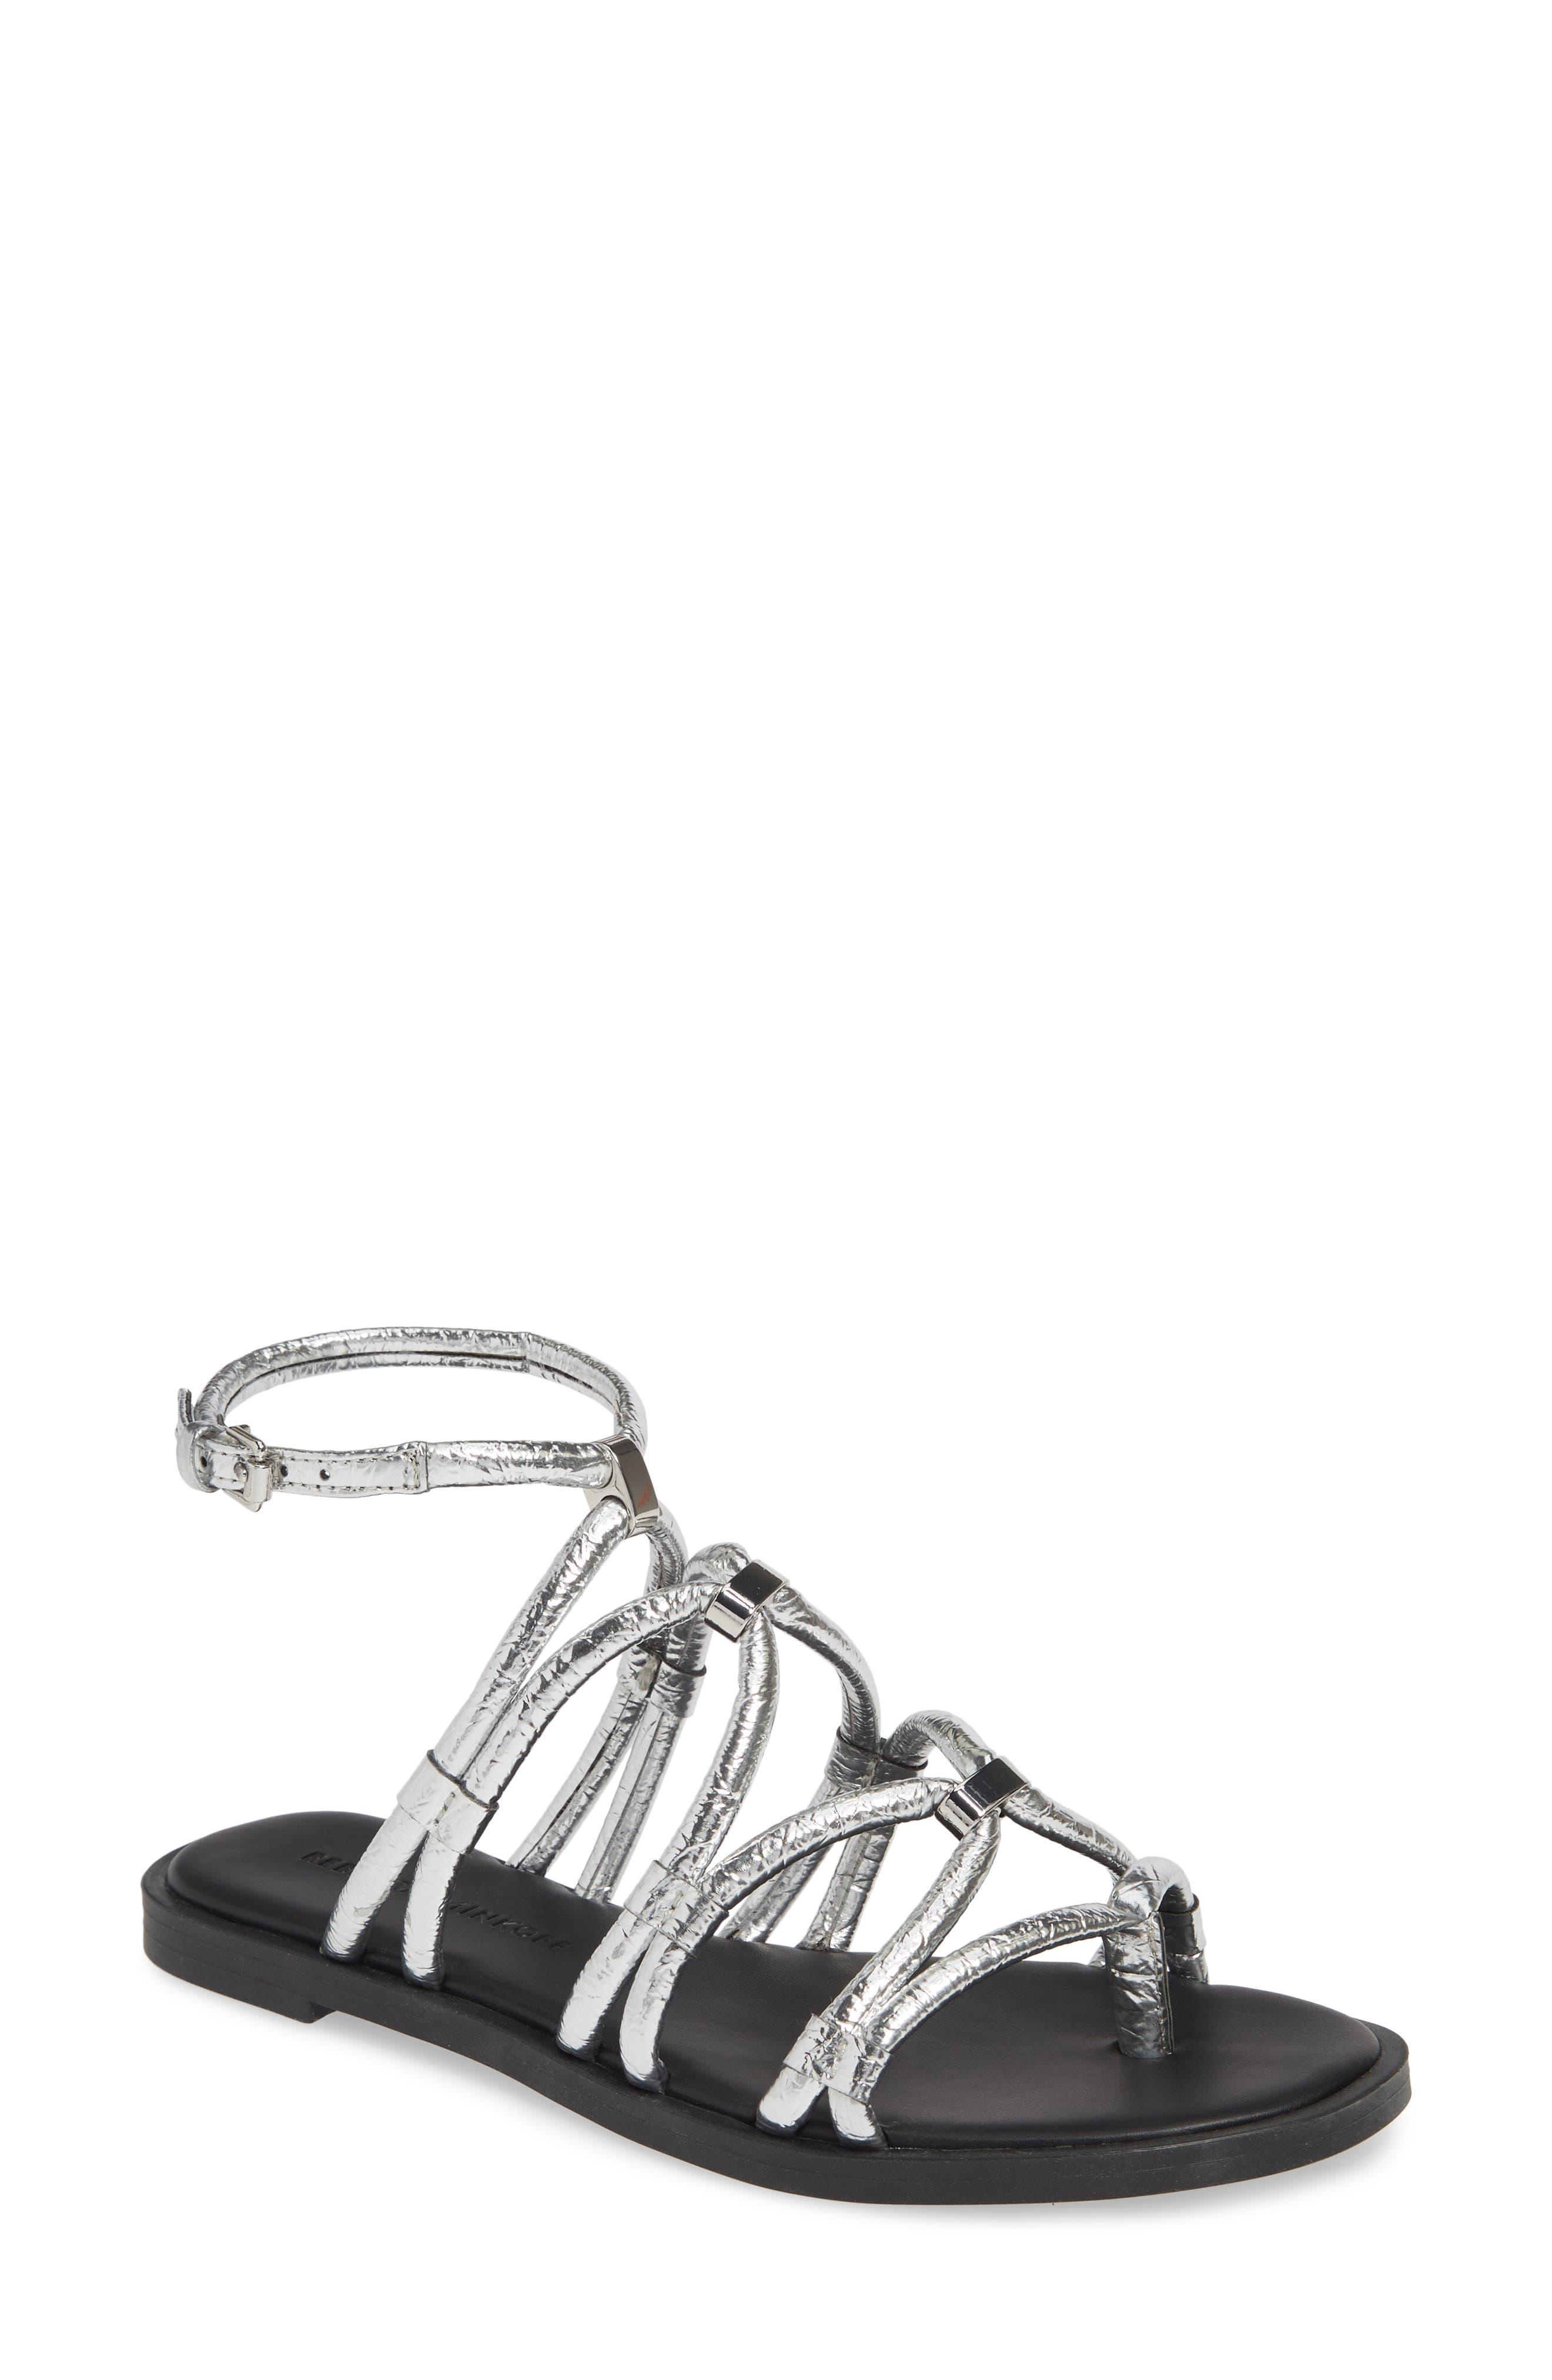 Rebecca Minkoff Sarle Strappy Sandal, Metallic